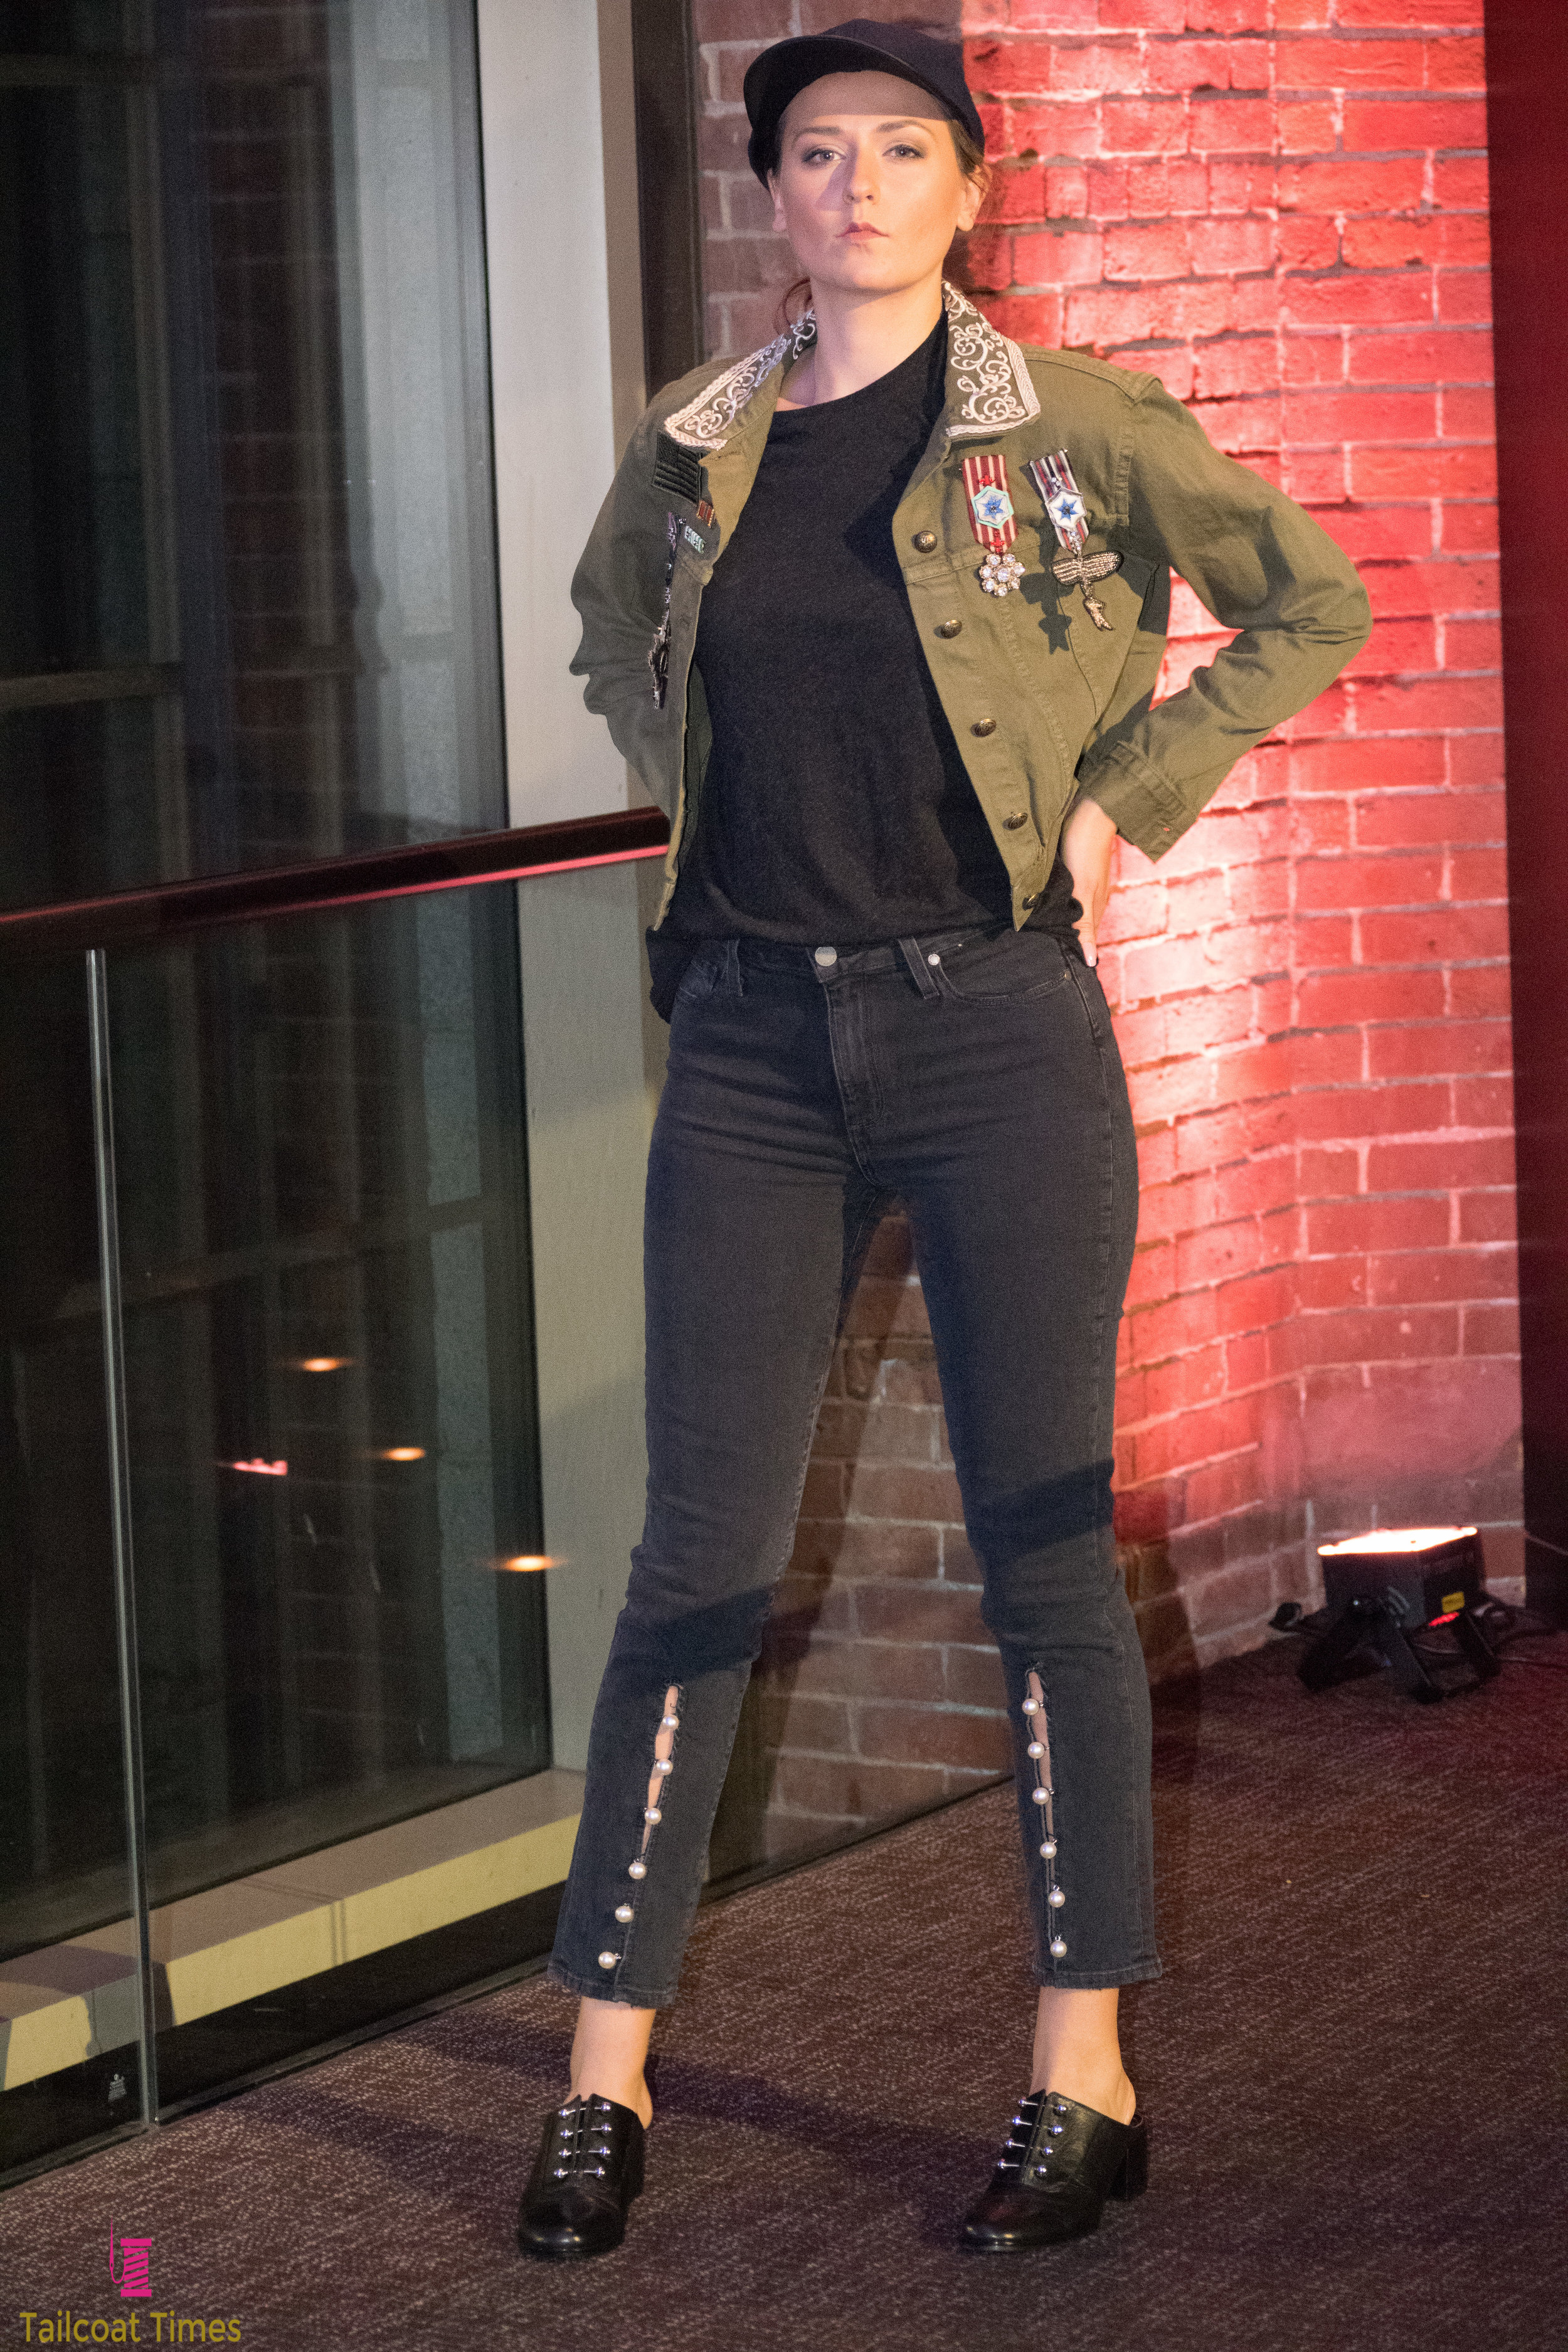 FashionablyLate_TrunkShow_Tailcoat Times (27 of 48).jpg